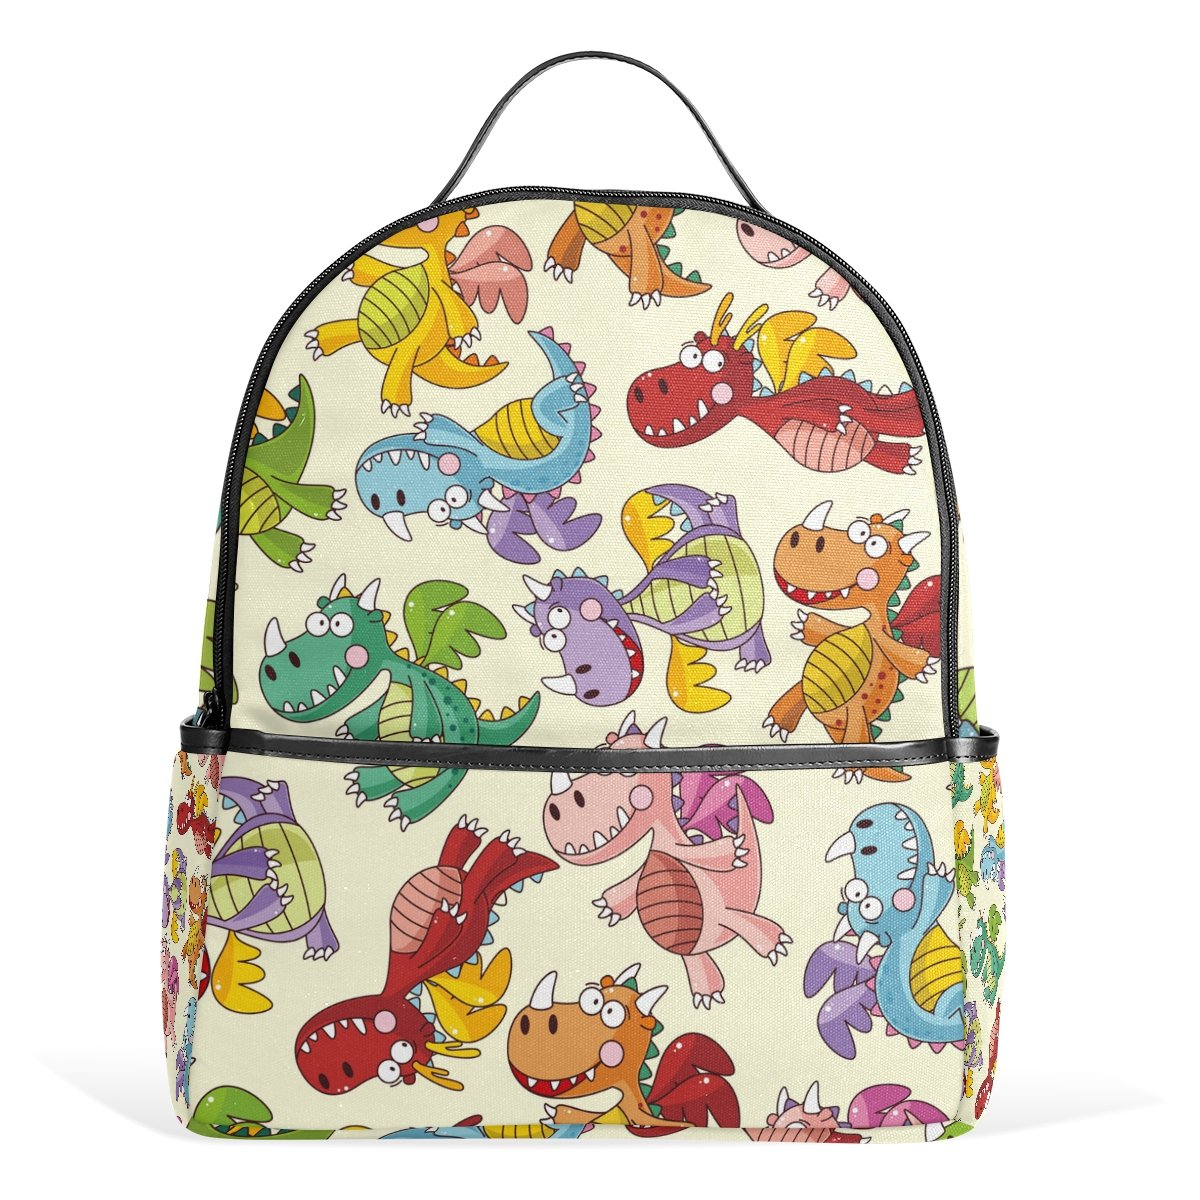 Amazon.com  Sunlome Cartoon Fire Dragon Pattern Laptop Backpack Casual  Shoulder Daypack for Student School Bag Handbag - Lightweight  Clothing 50869fc0e0667